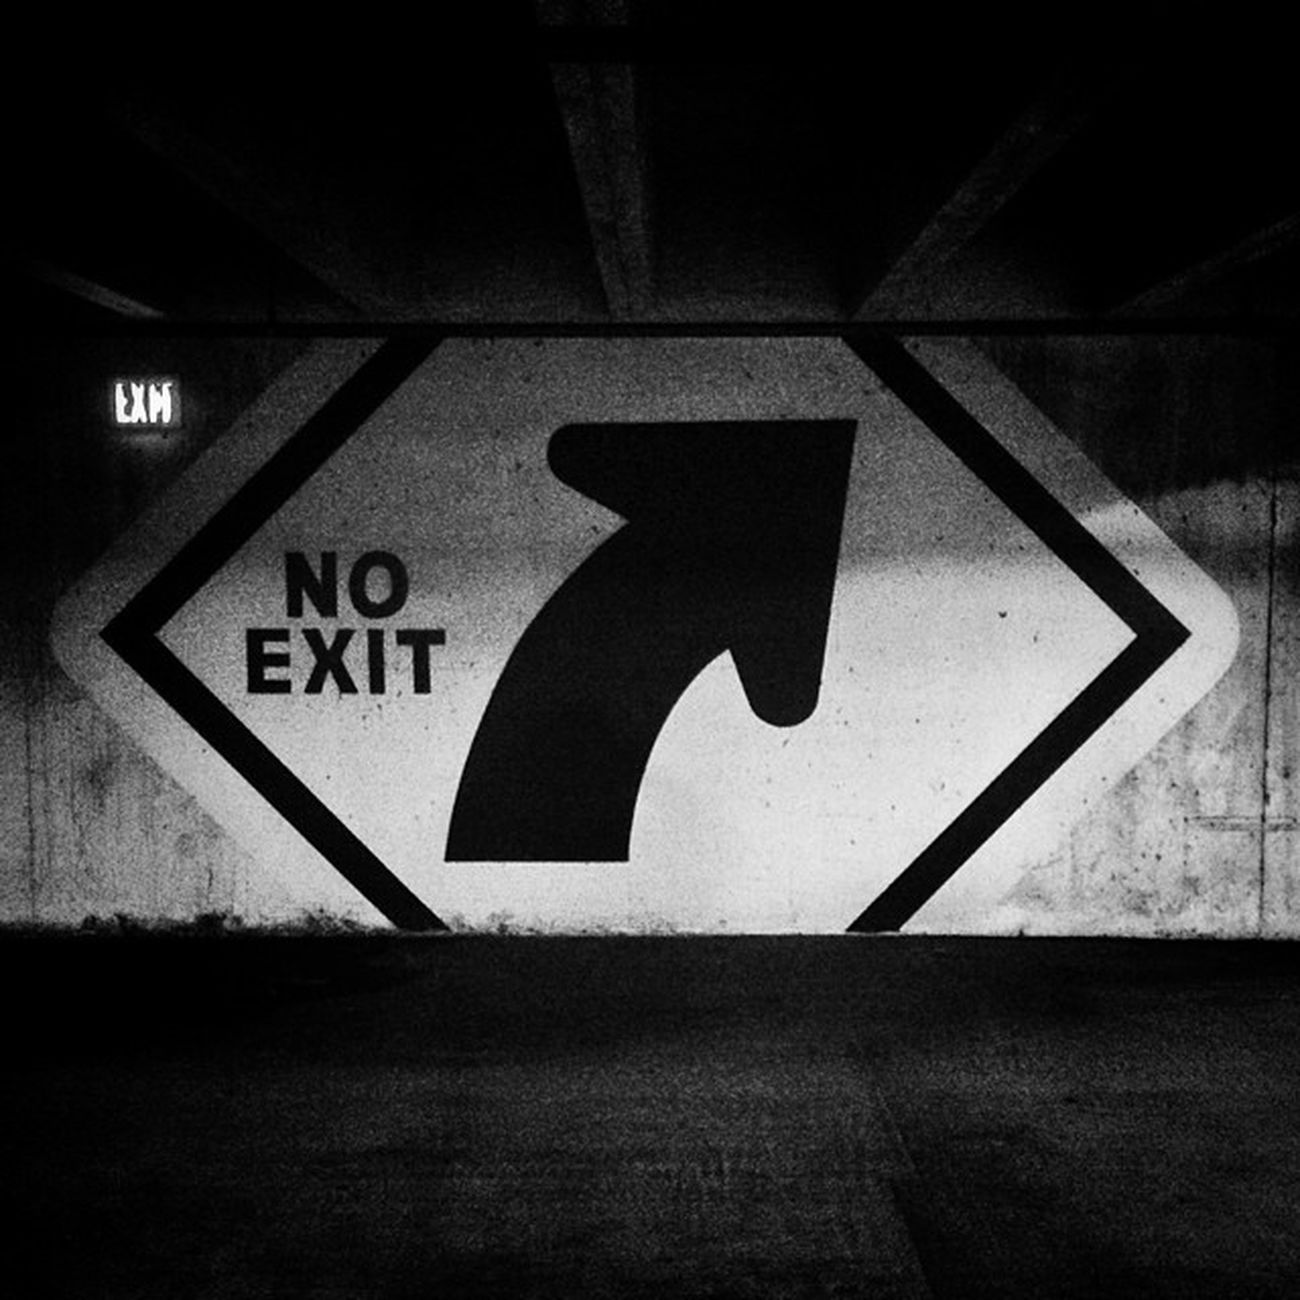 No Exit Dma  Dallasmuseumofart DFW Blackandwhite bw